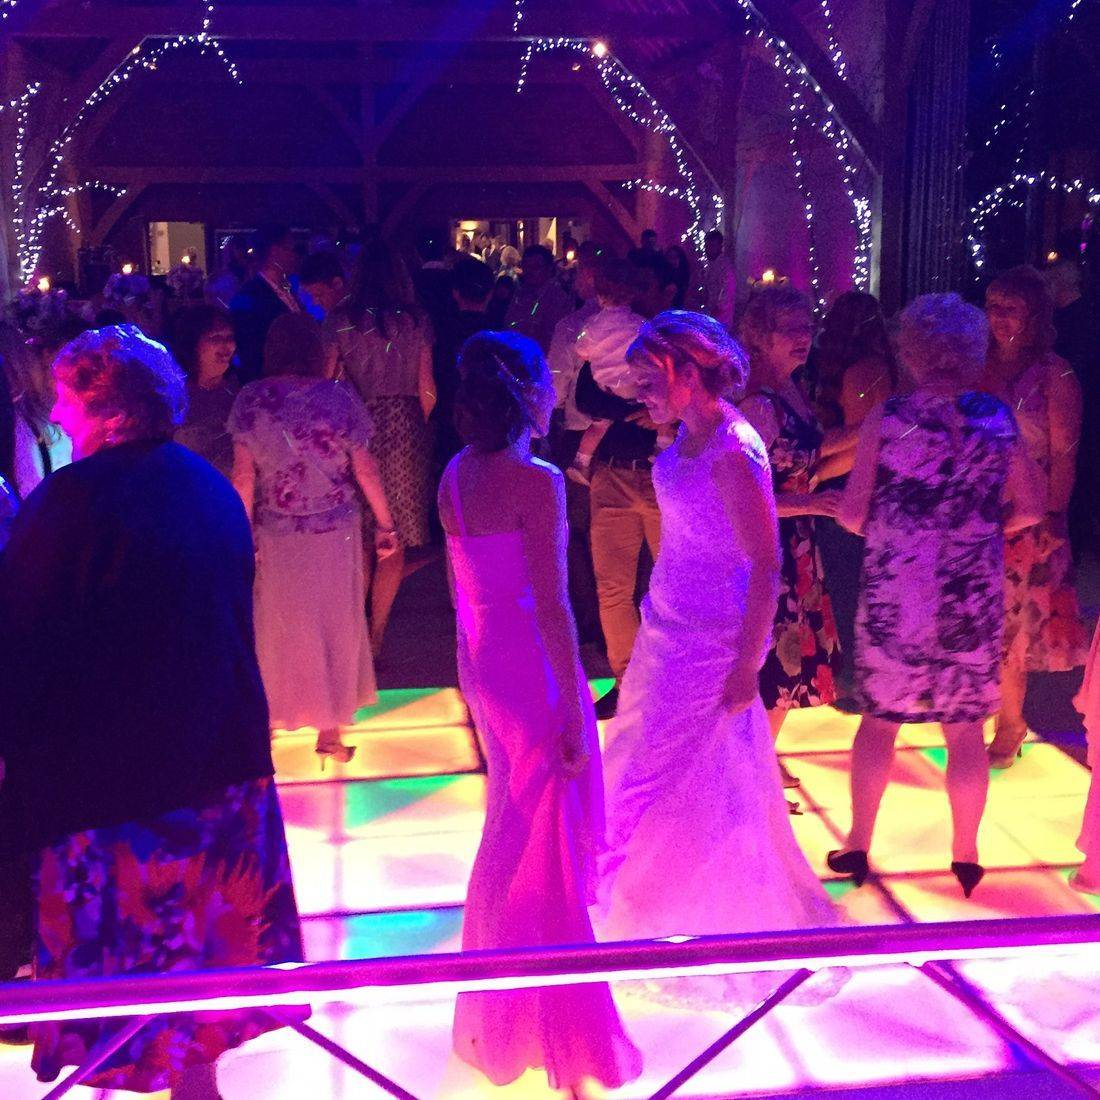 LED Starlit Dancefloor Stourbridge led Dancefloor Hire